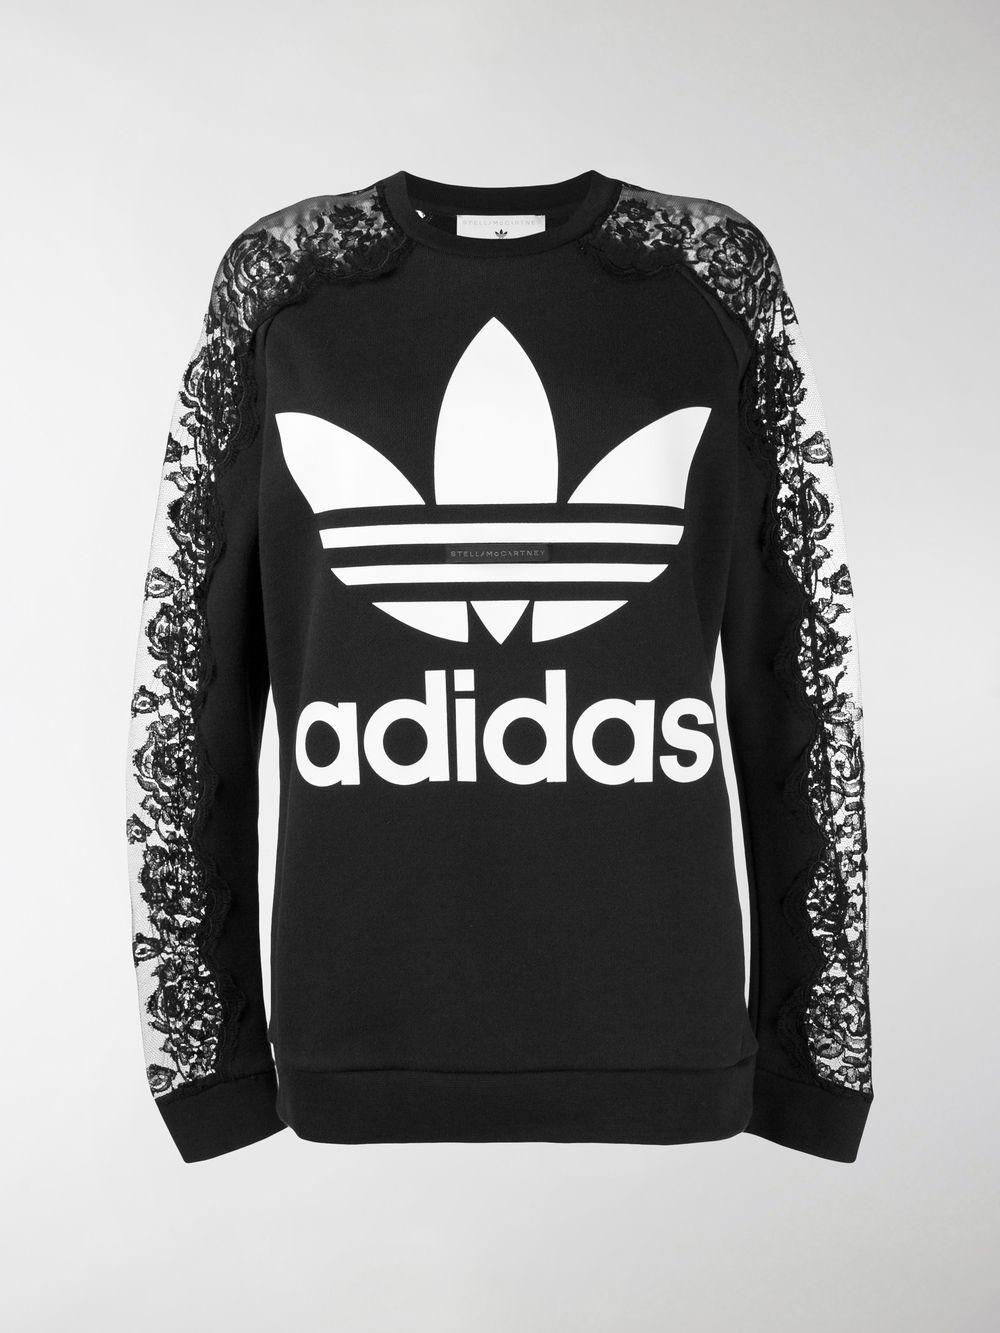 4c74f0650b Stella McCartney Adidas 3-stripe Lace Sweater in Black - Save 55% - Lyst